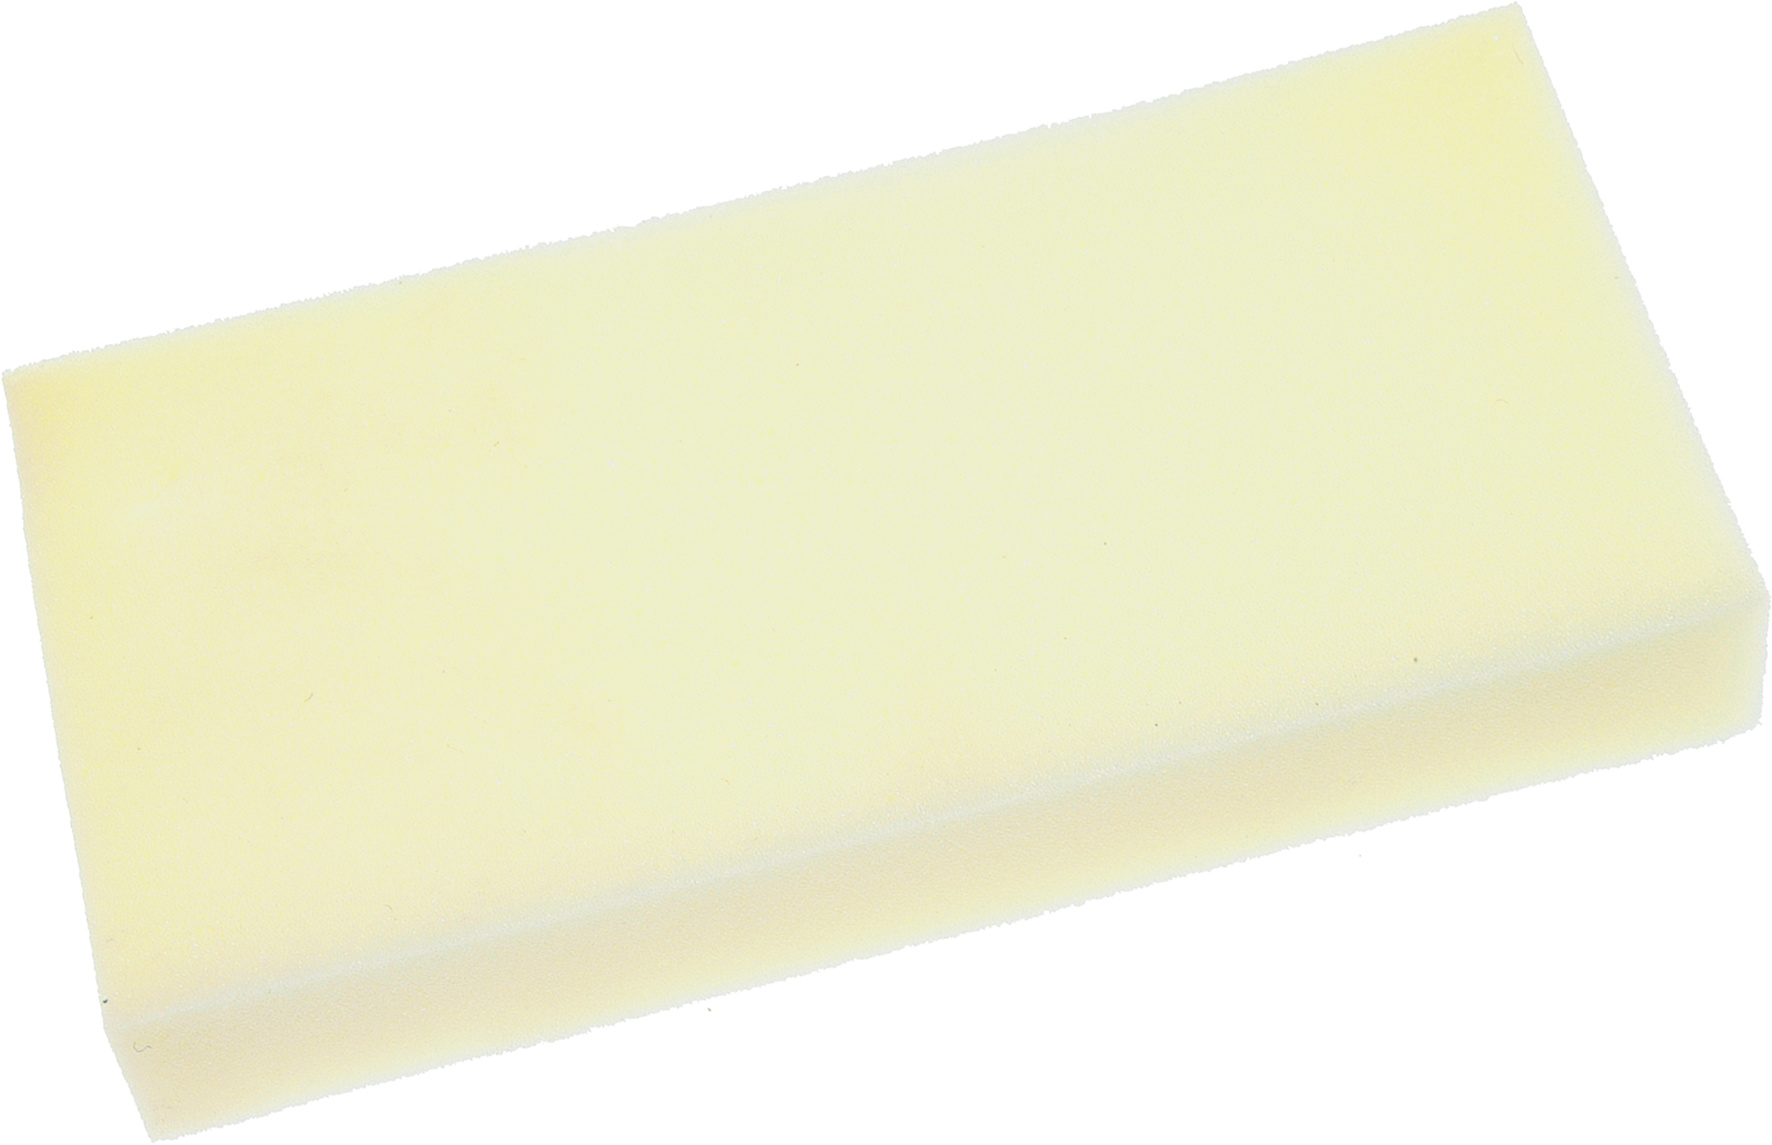 HEVU TOOLS HEVU Vervangend fijne spons 280x140x40 mm - wit